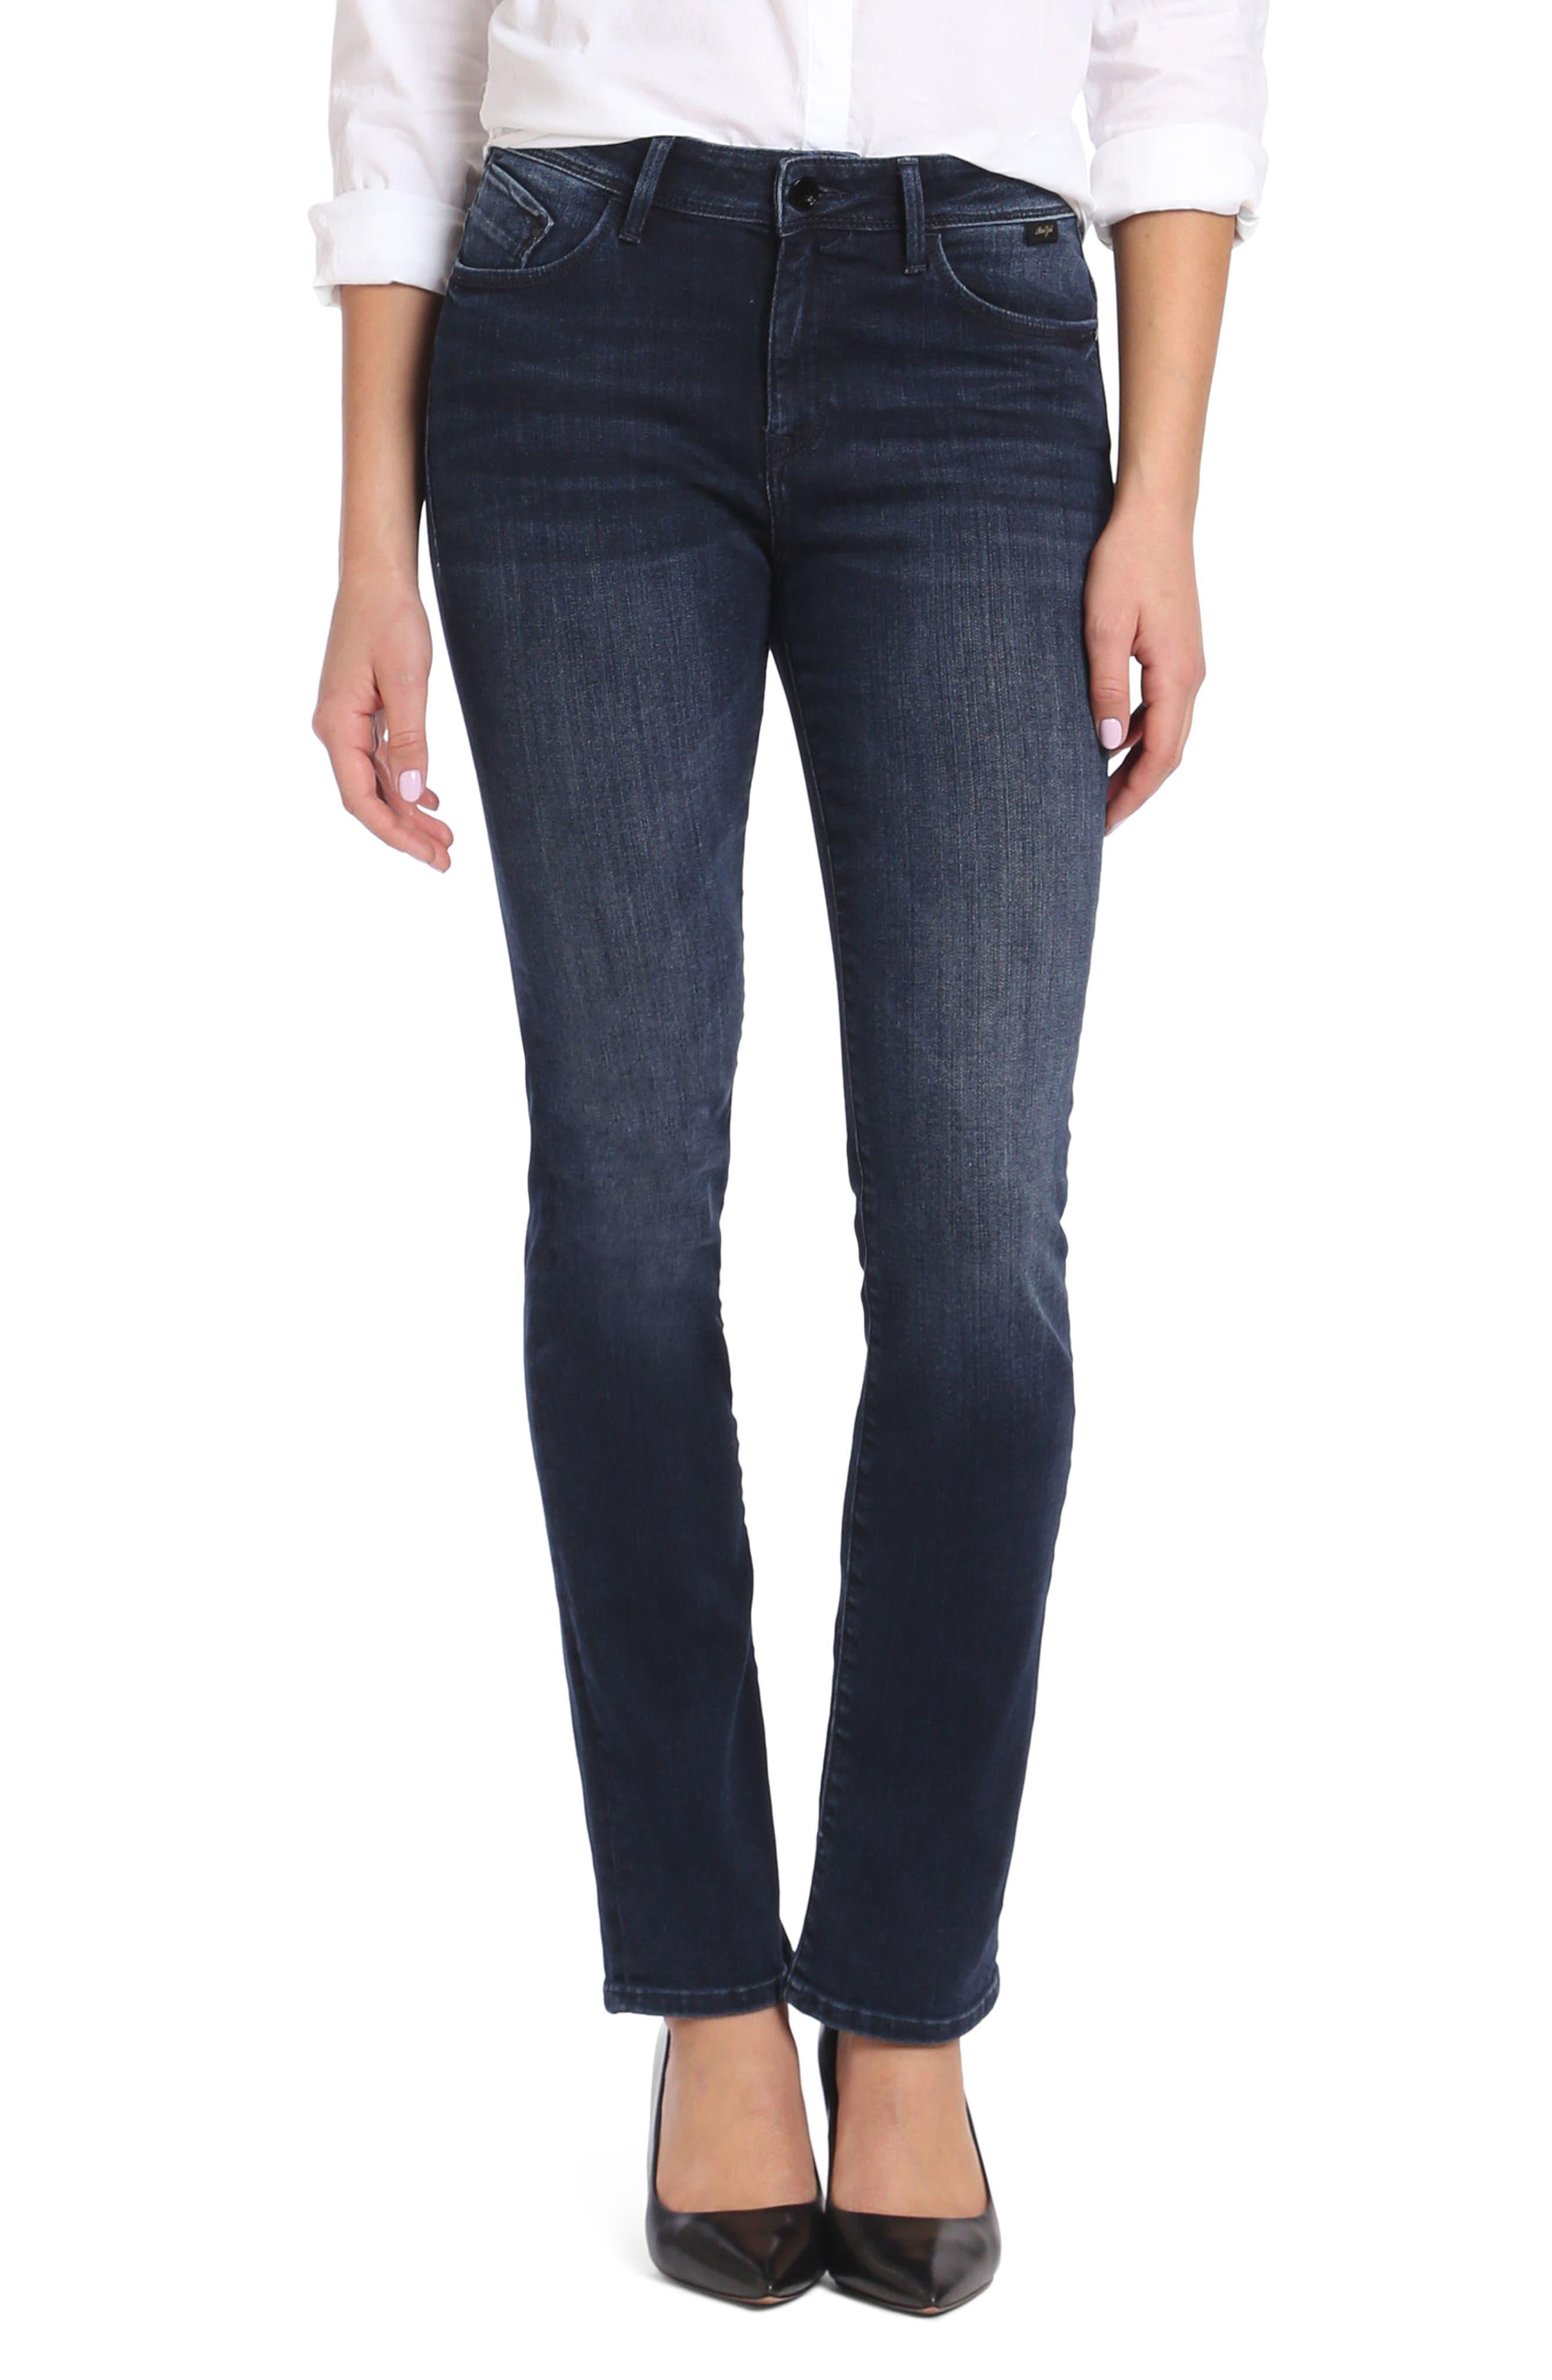 Alternate Image 1 Selected - Mavi Jeans Kendra High Waist Straight Jeans (Deep Ink Gold)